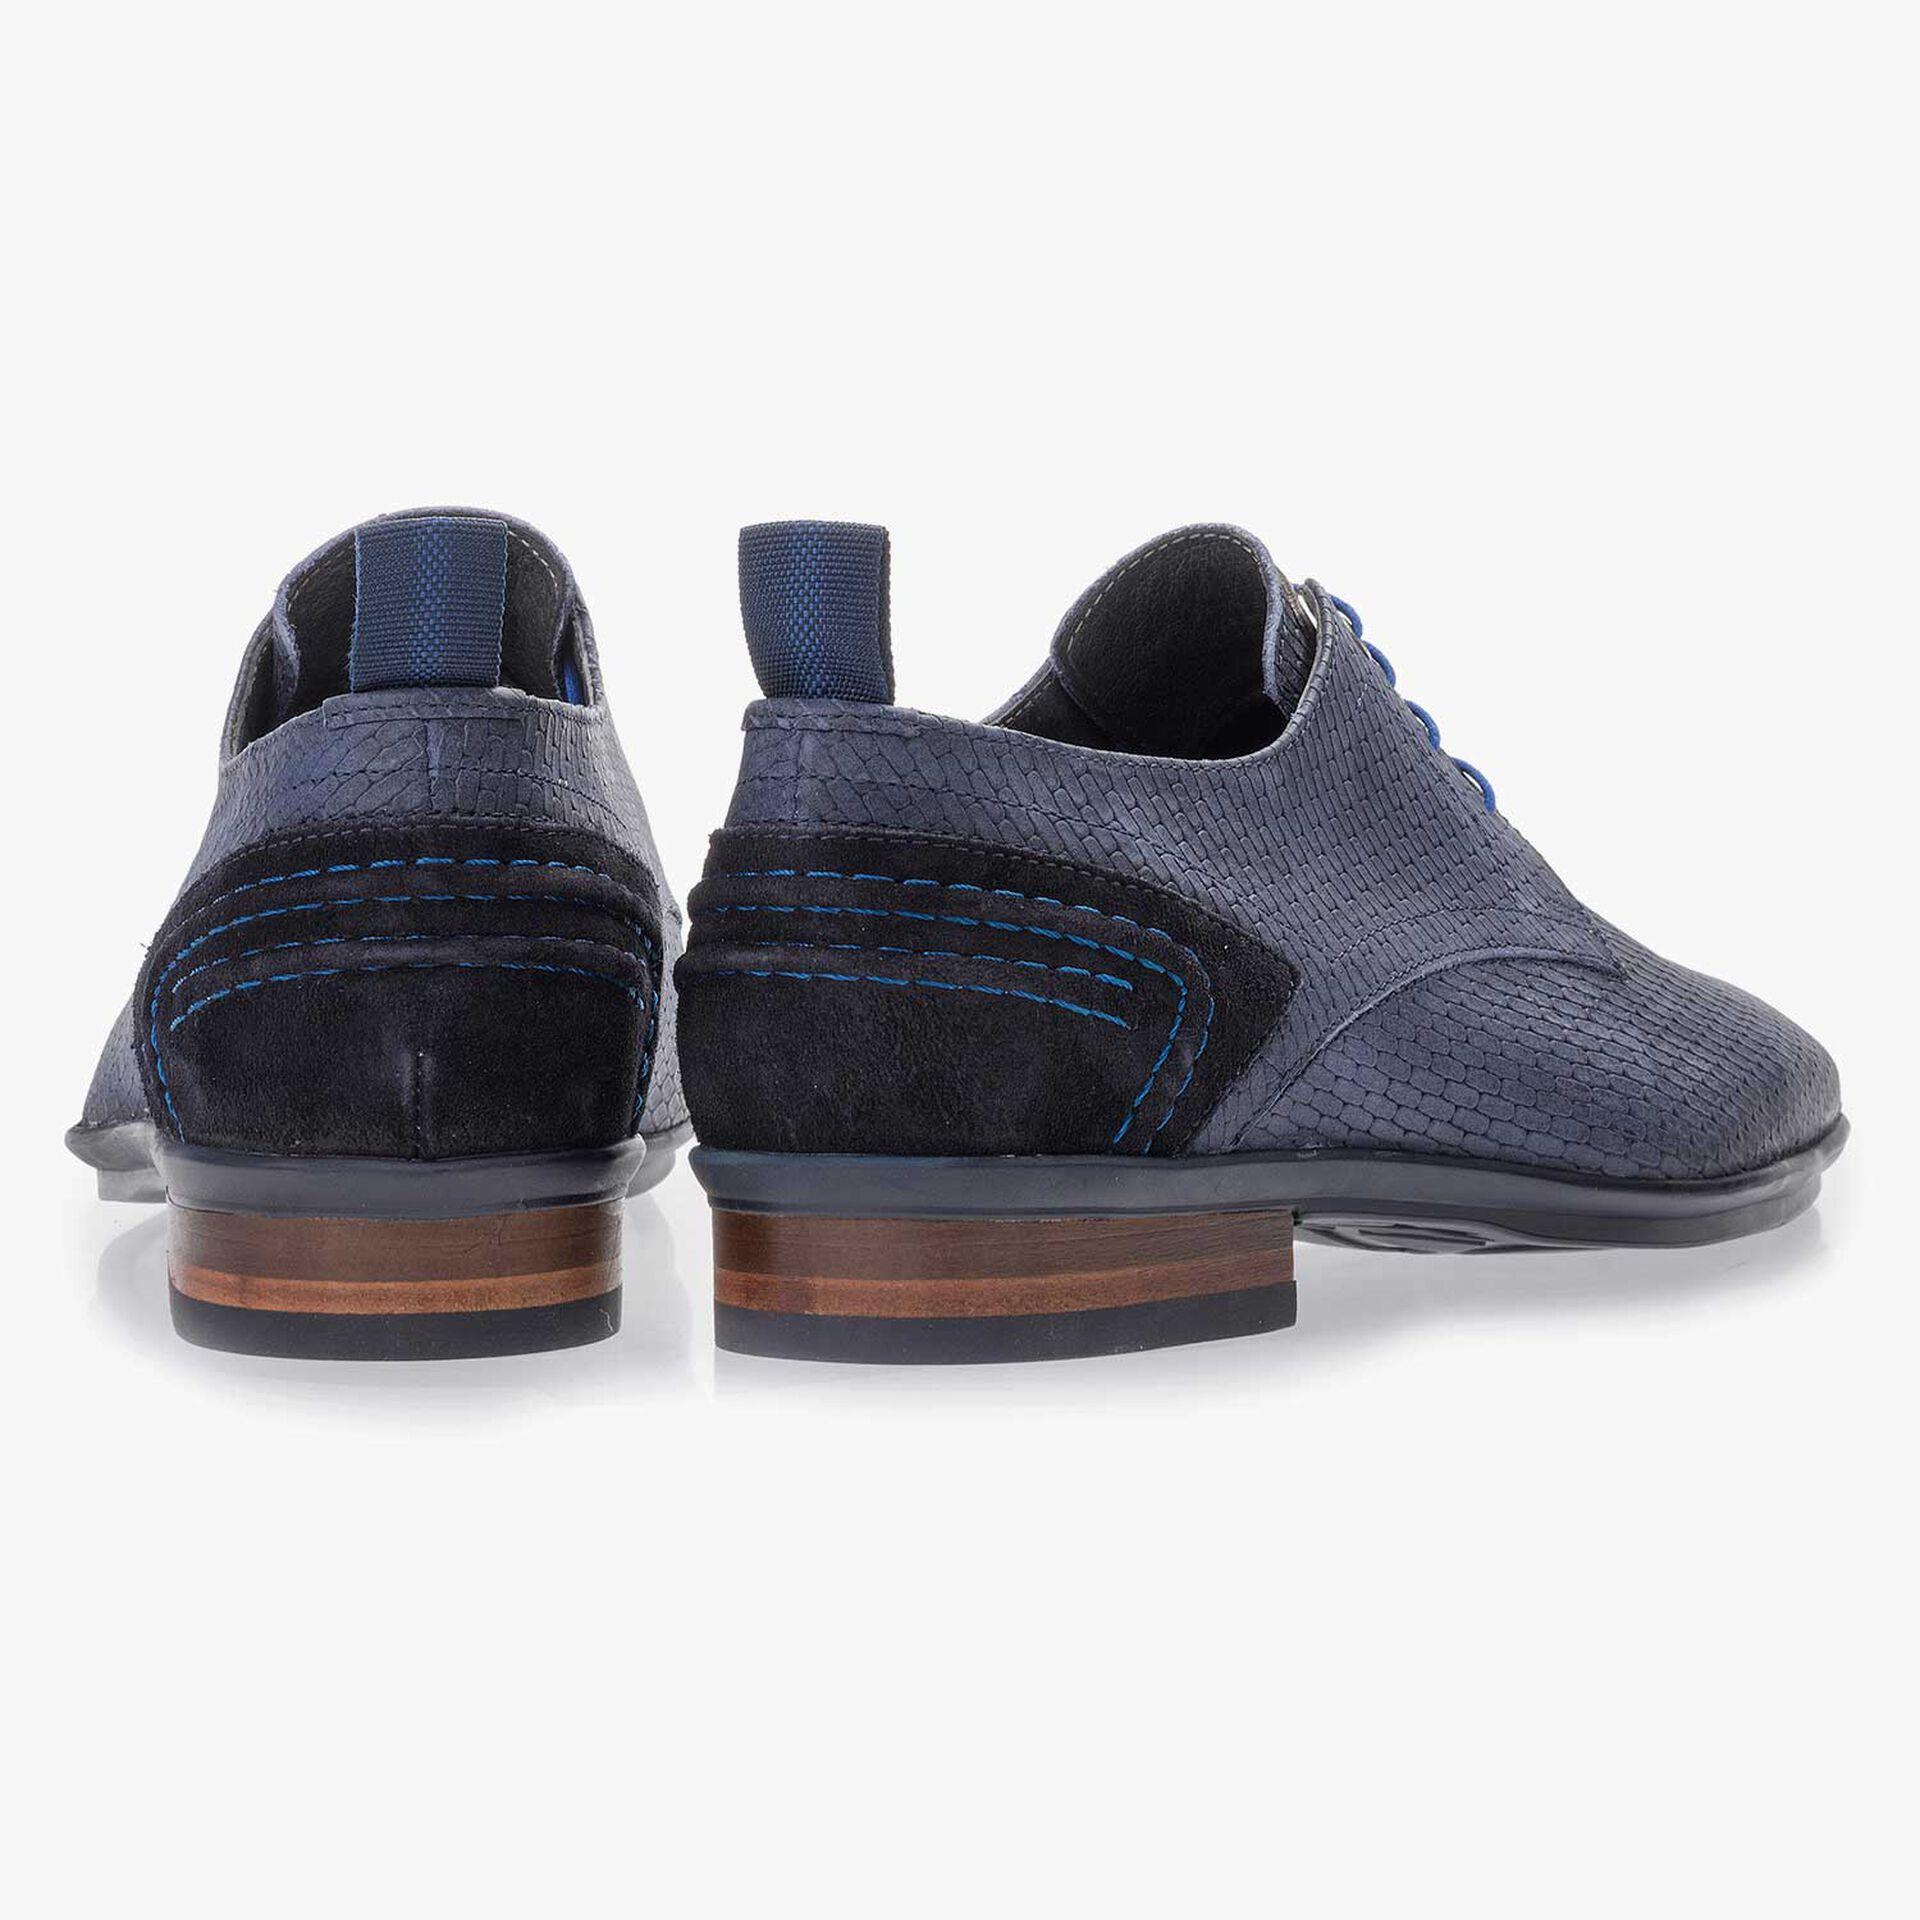 Blue nubuck leather lace shoe